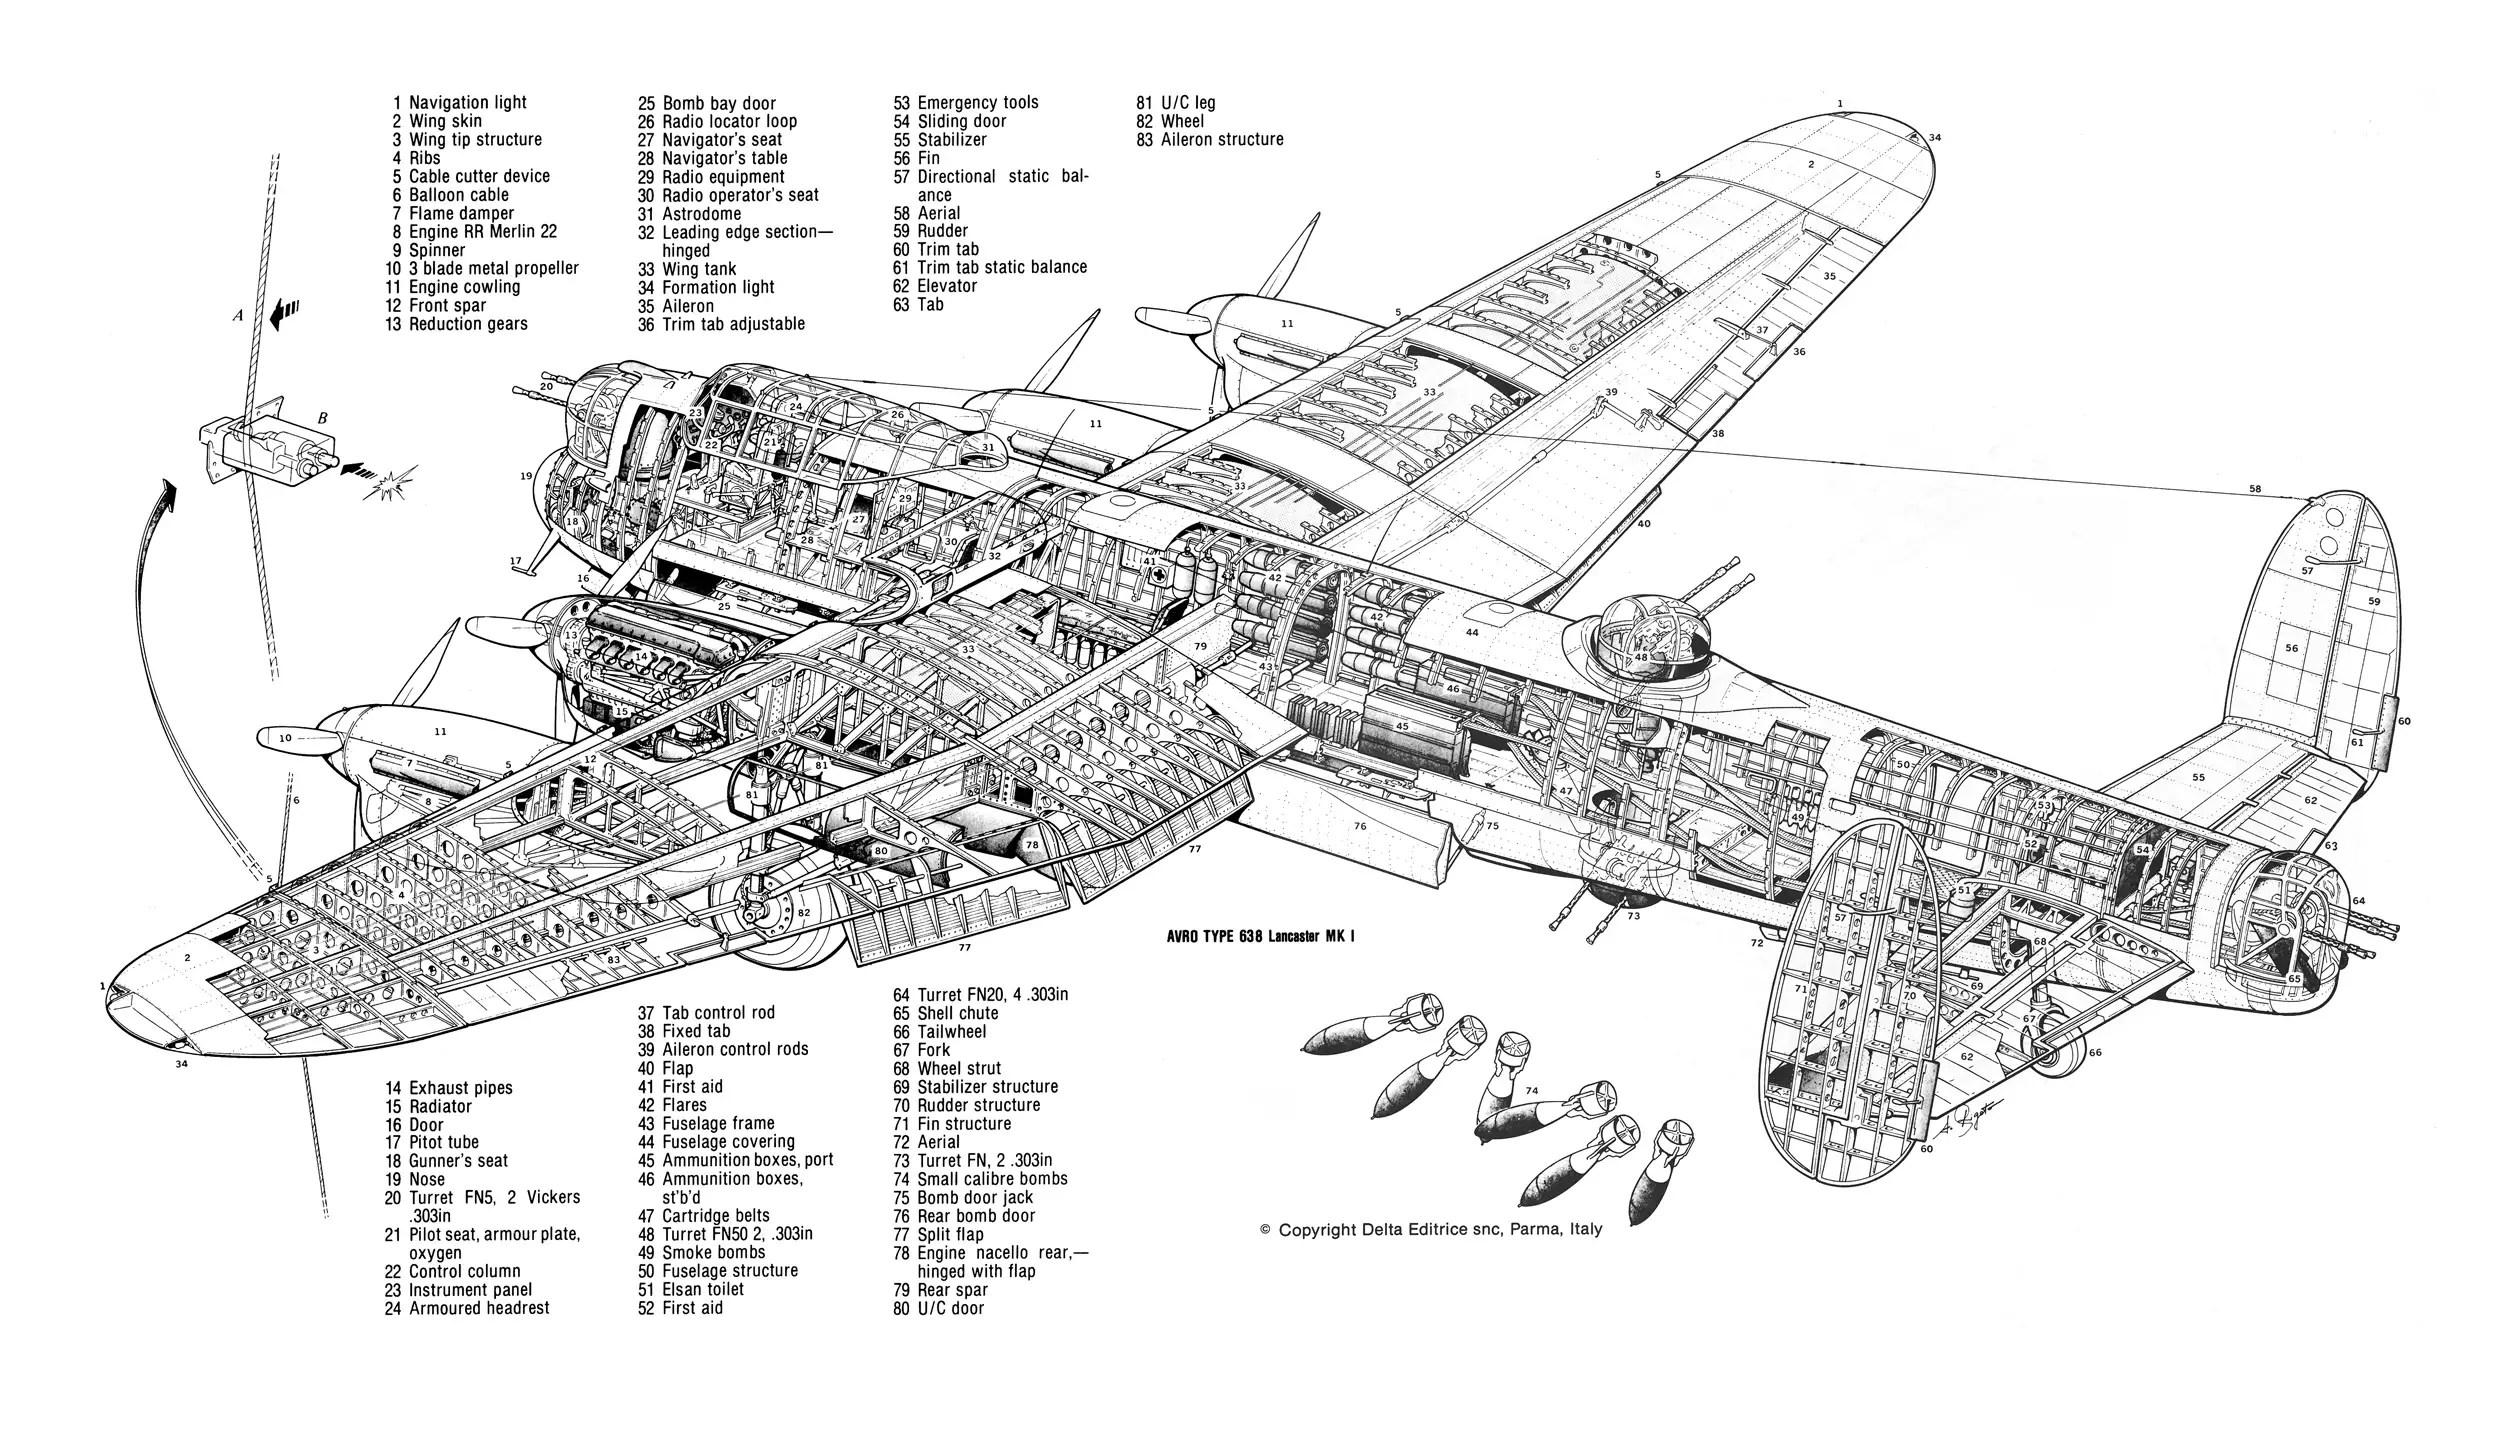 Avro Lancaster Cutaway Sketch Coloring Page